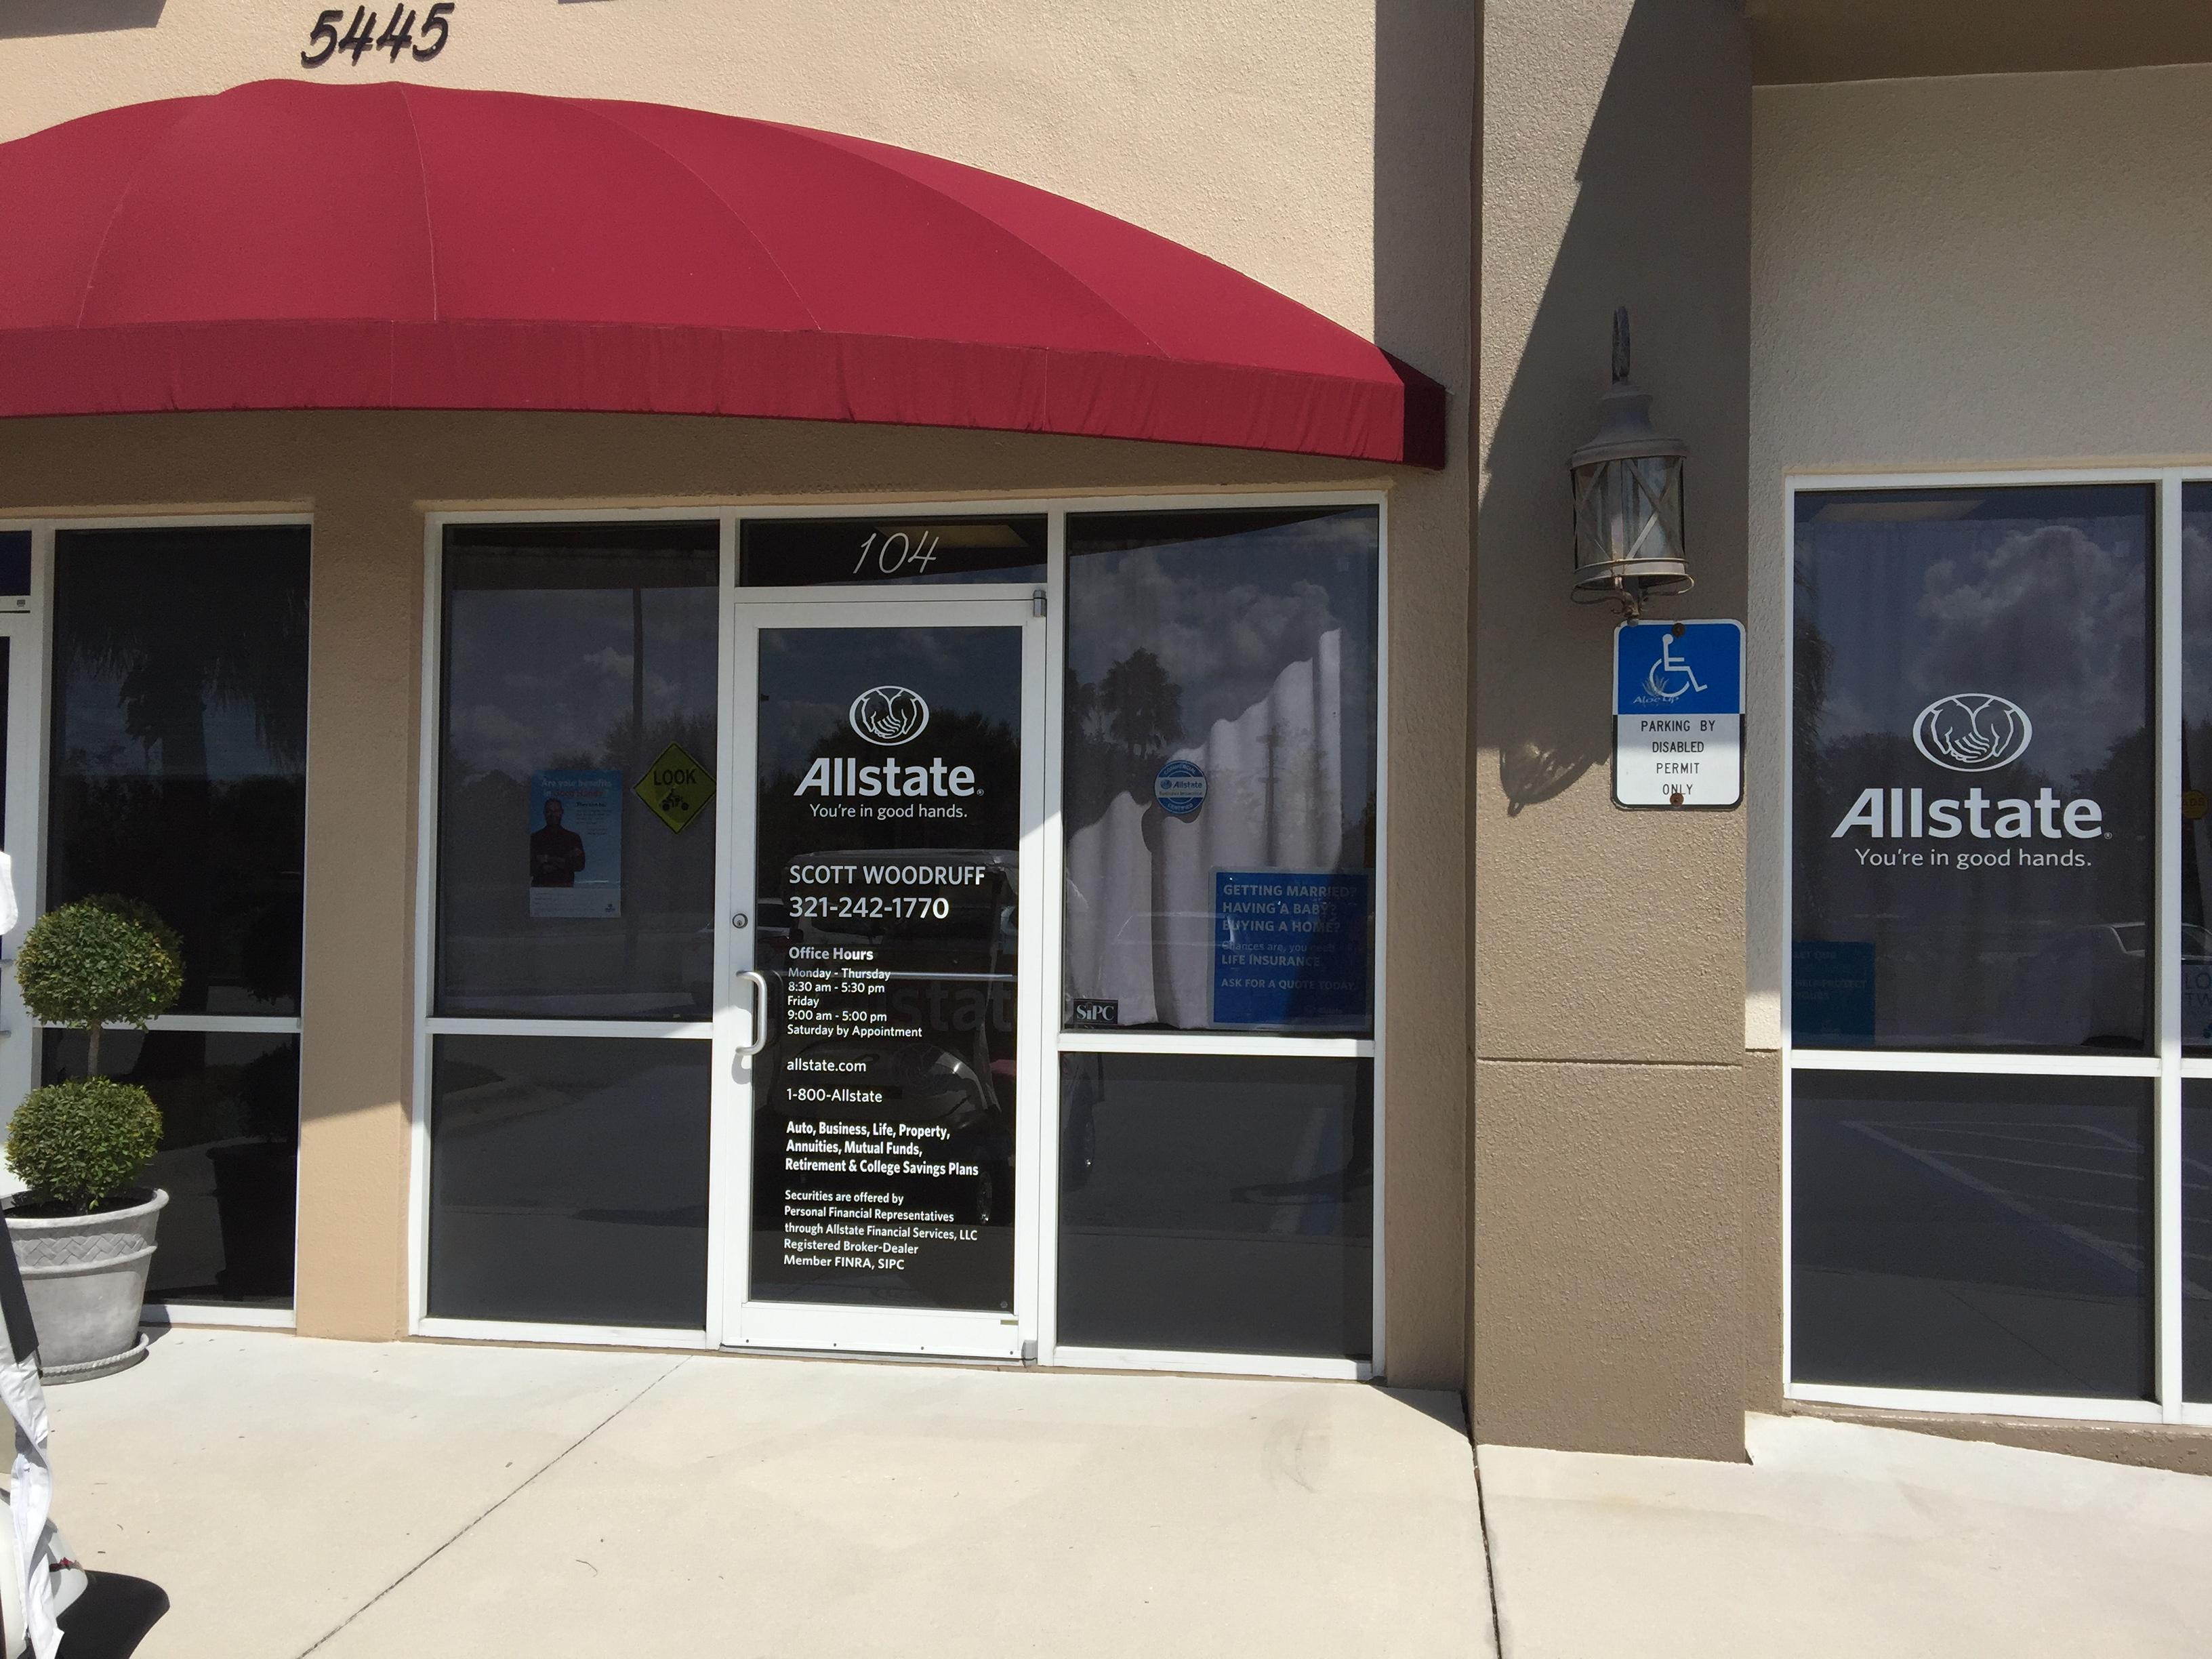 Scott Woodruff: Allstate Insurance image 2